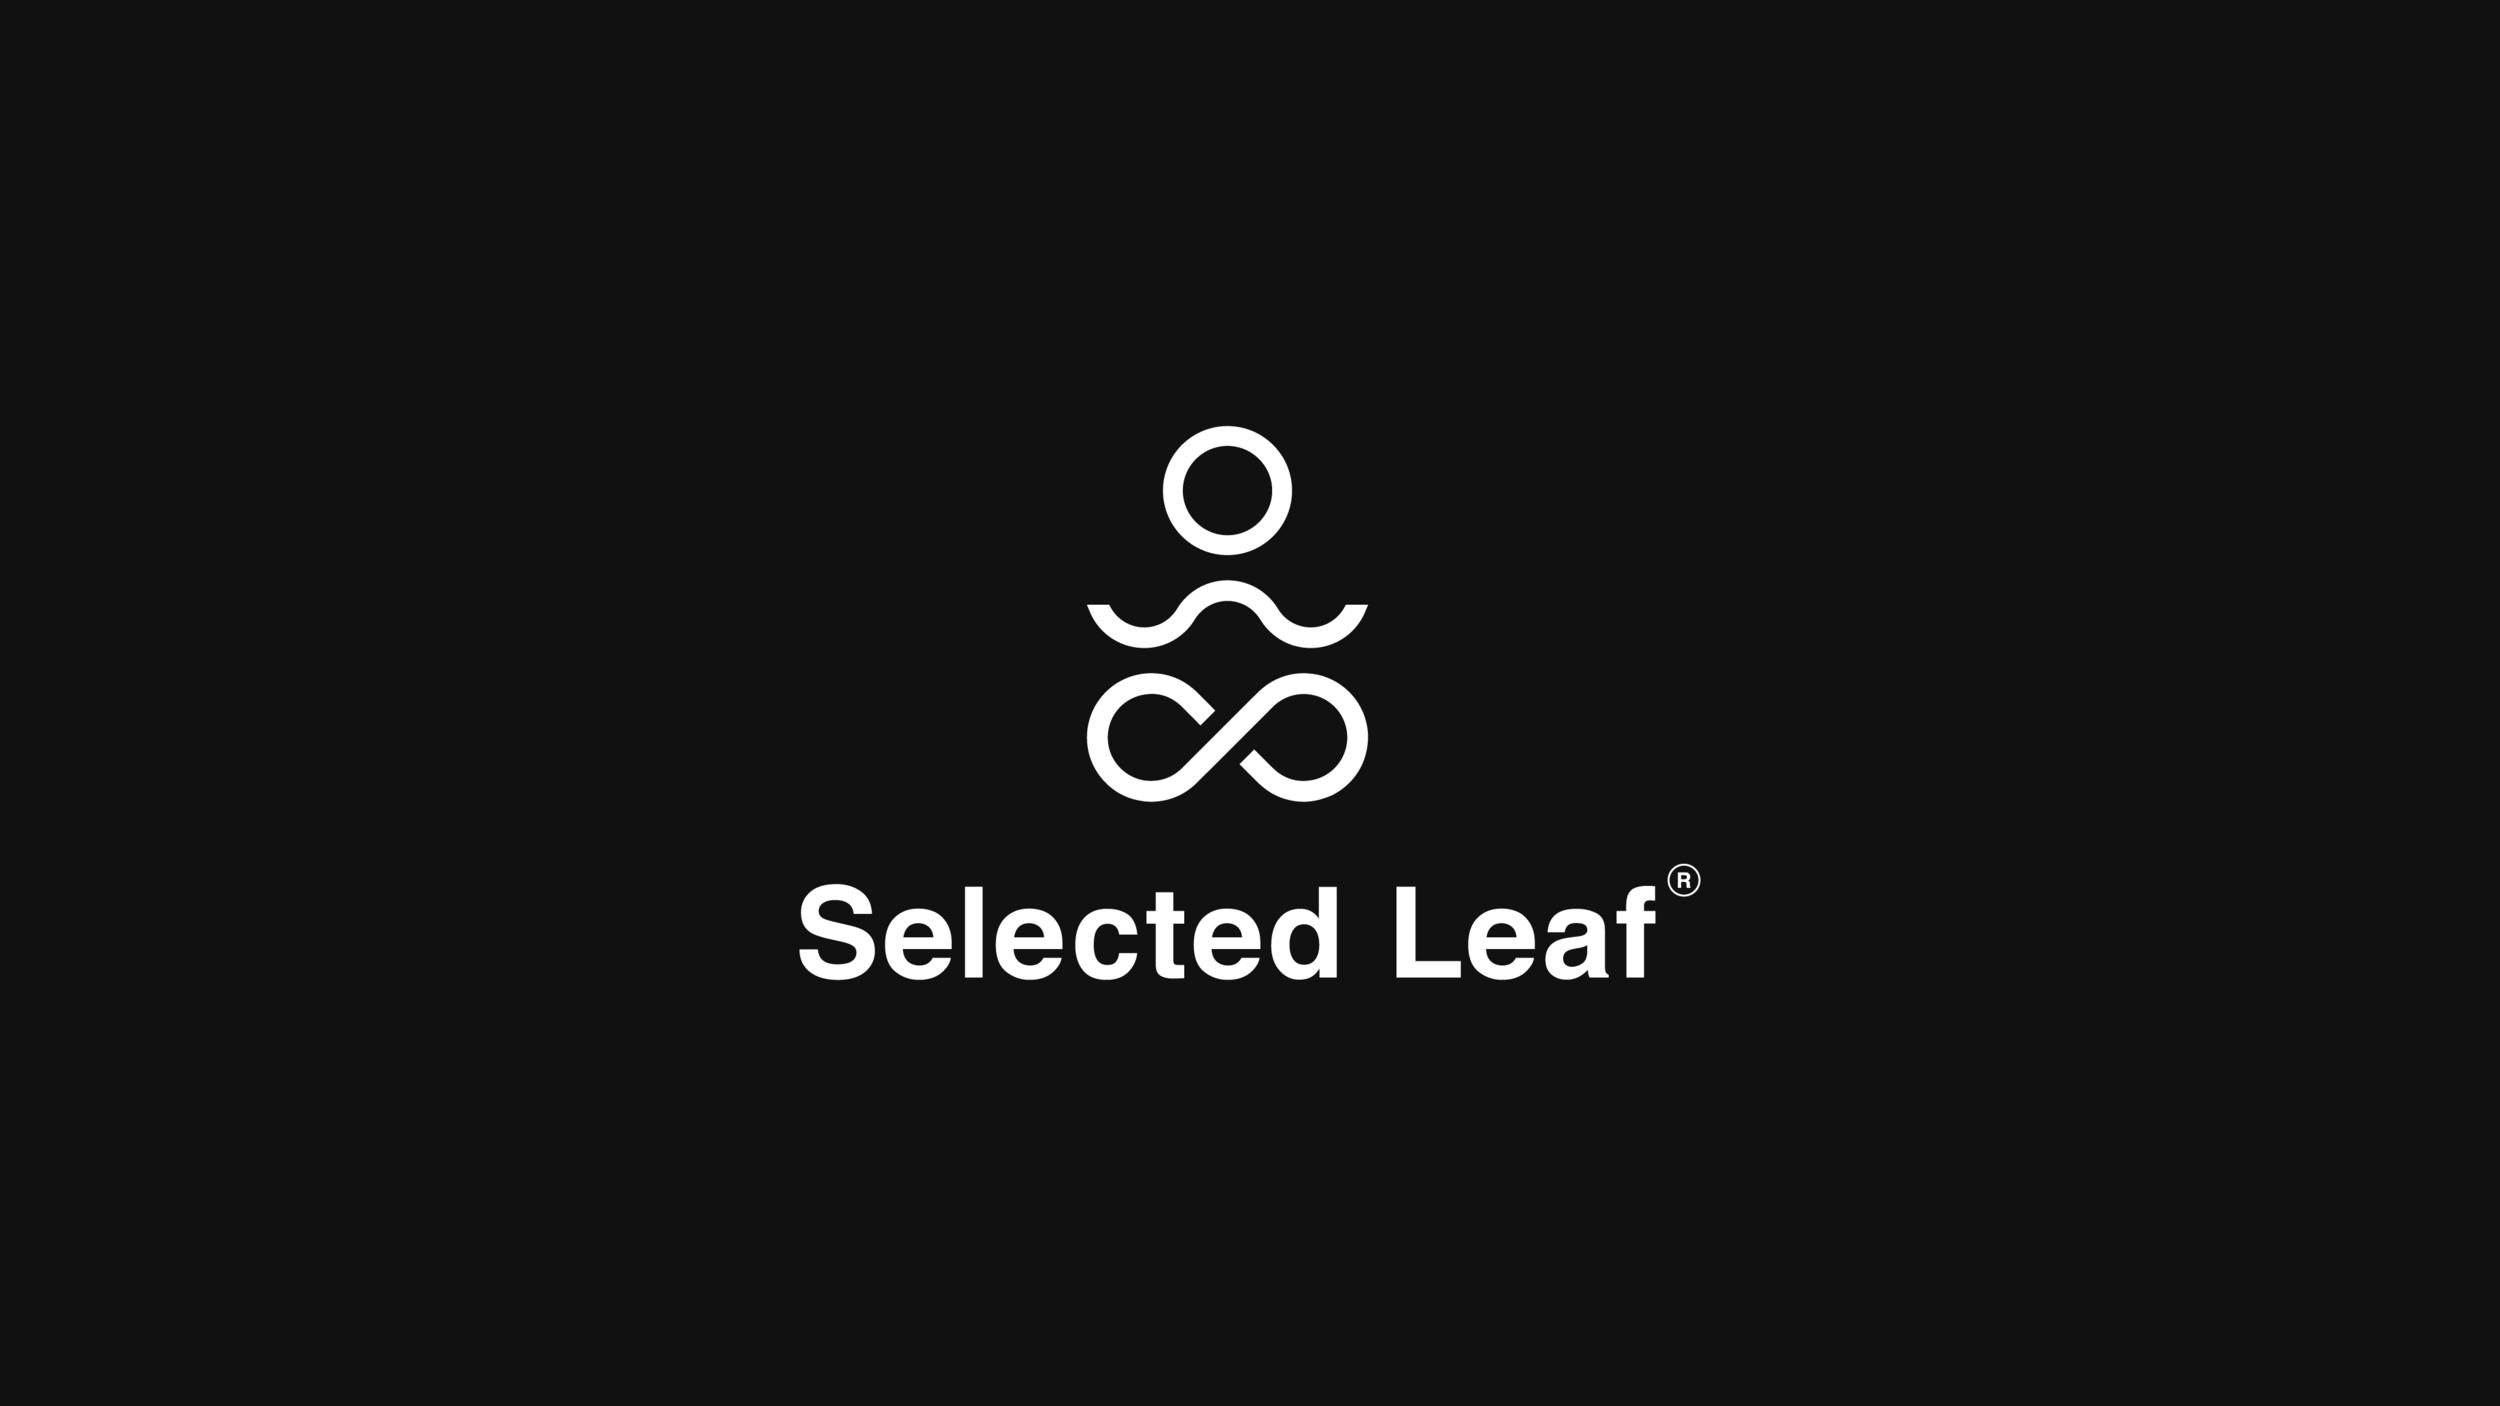 Selected Leaf  - Brand Identity & Packaging Design